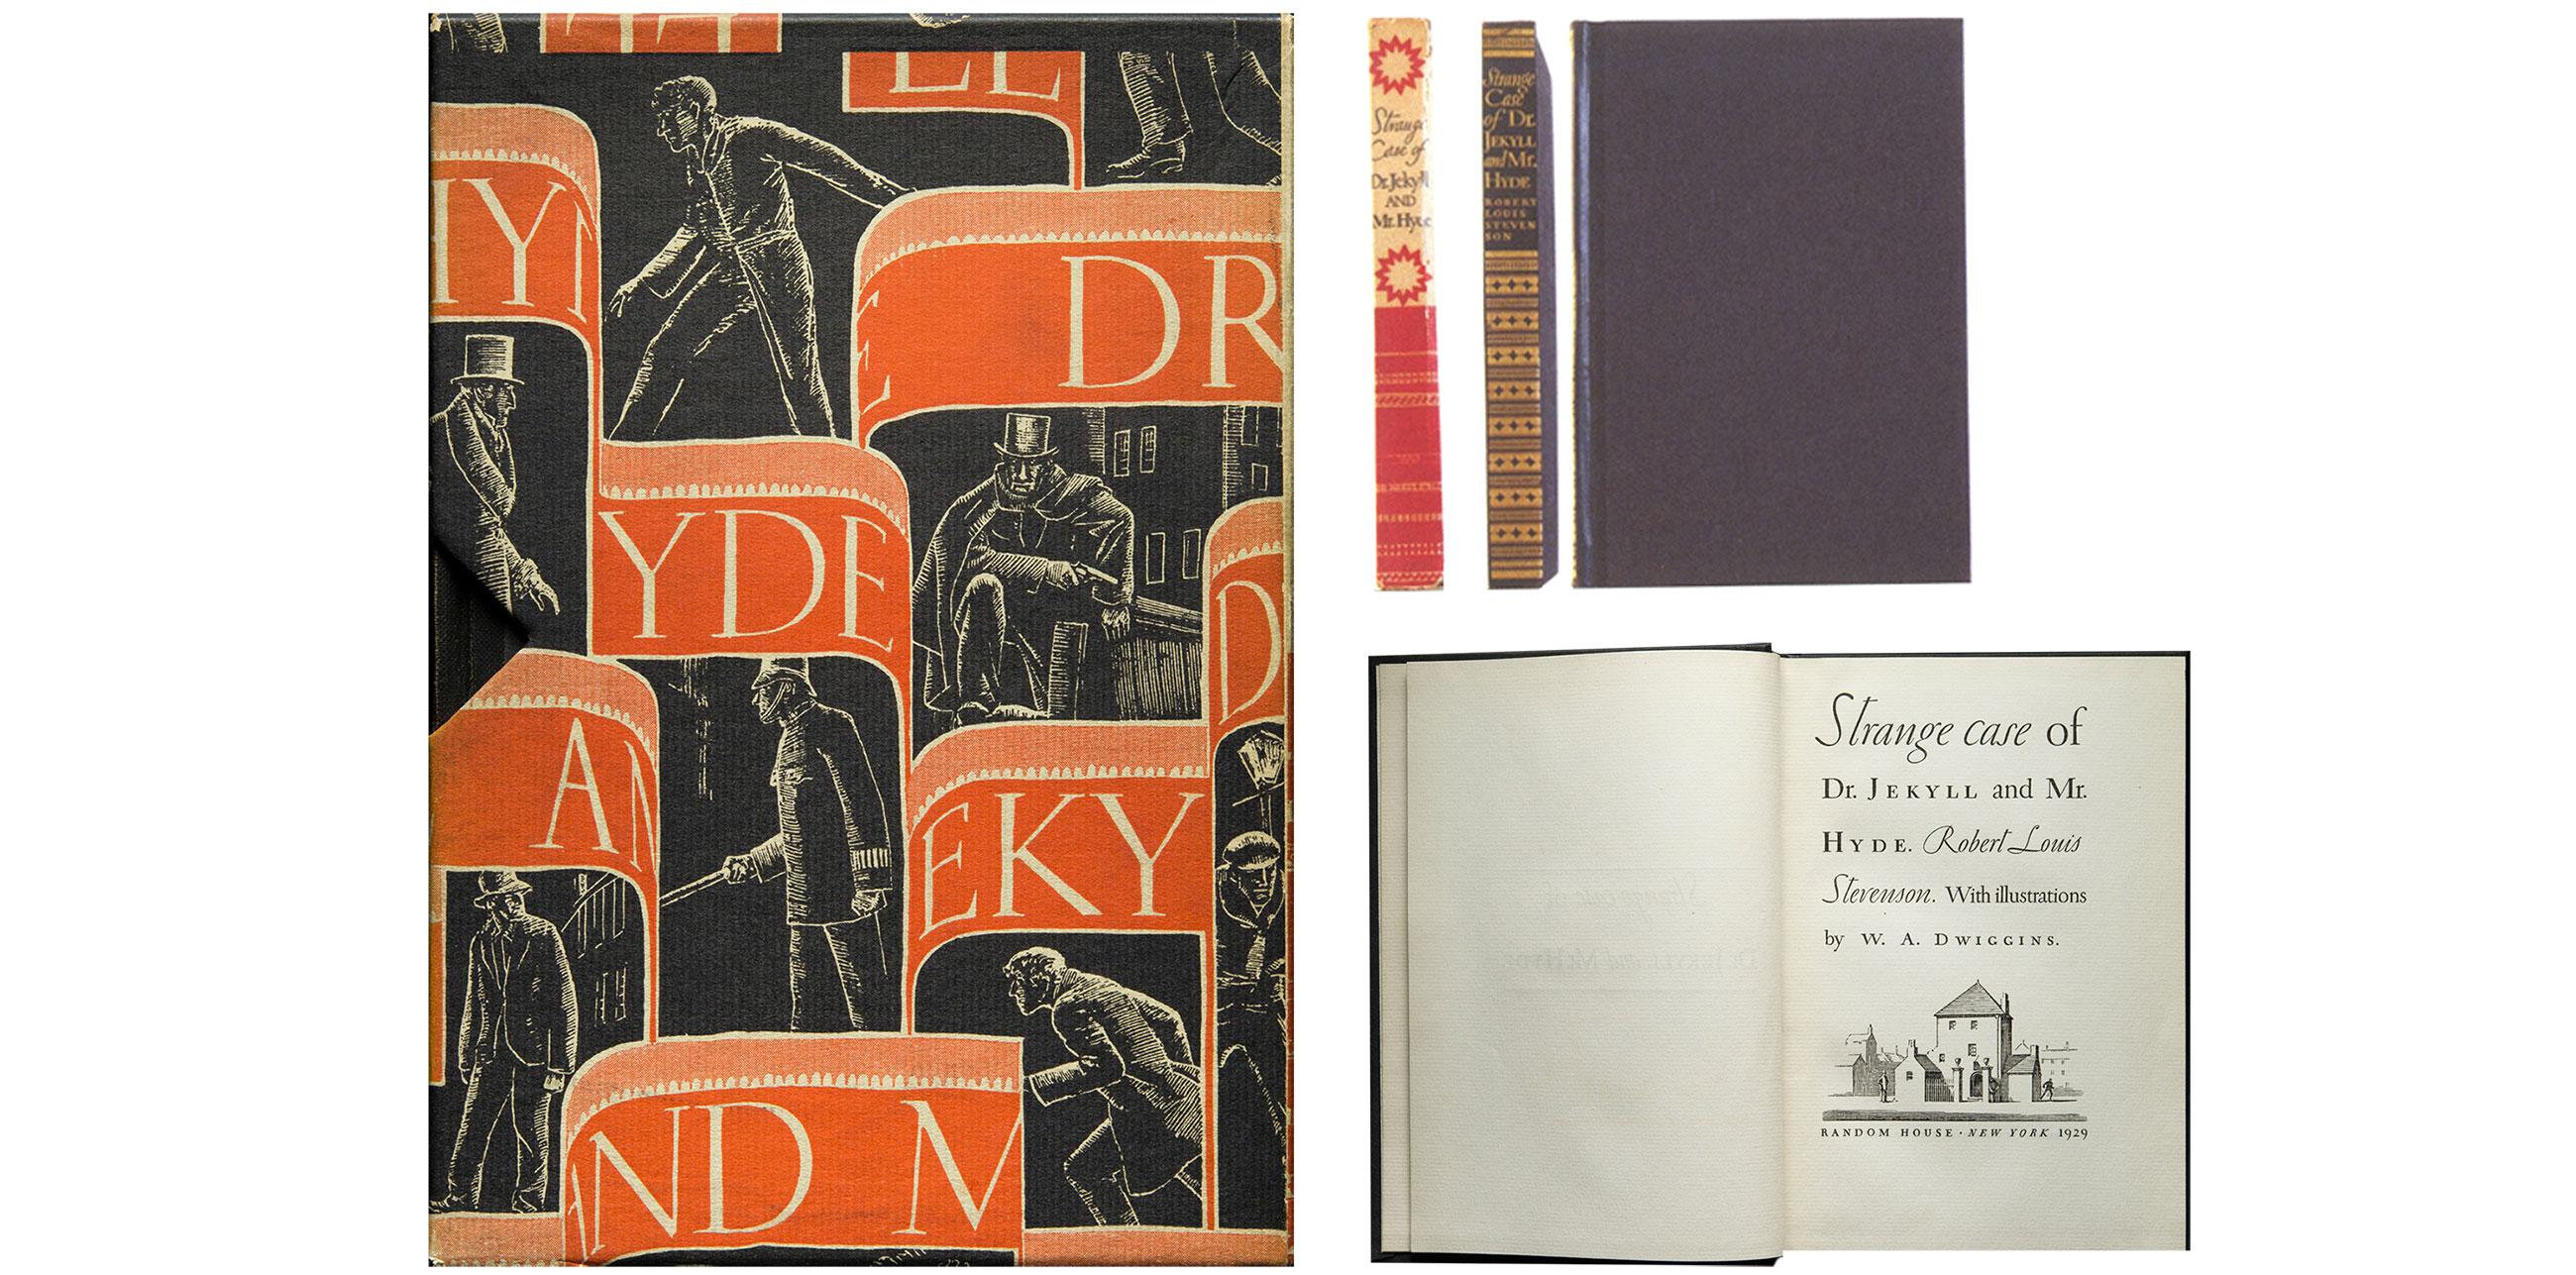 William-Addison-Dwiggins-Strange Case of Dr. Jekyll and Mr. Hyde-1929